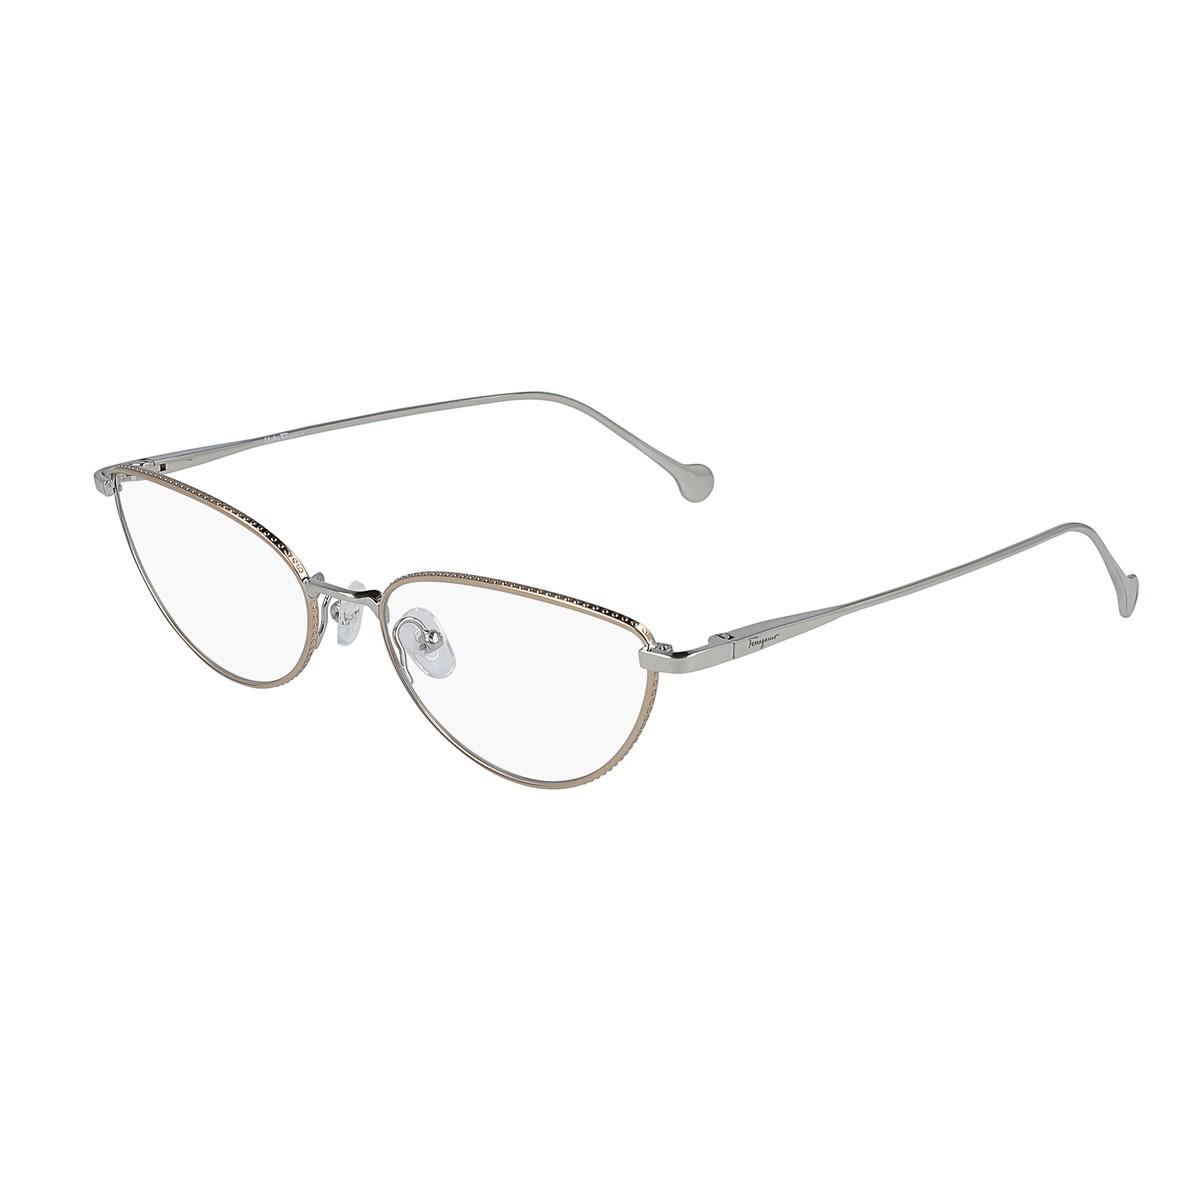 Salvatore Ferragamo SF2188   Women's eyeglasses